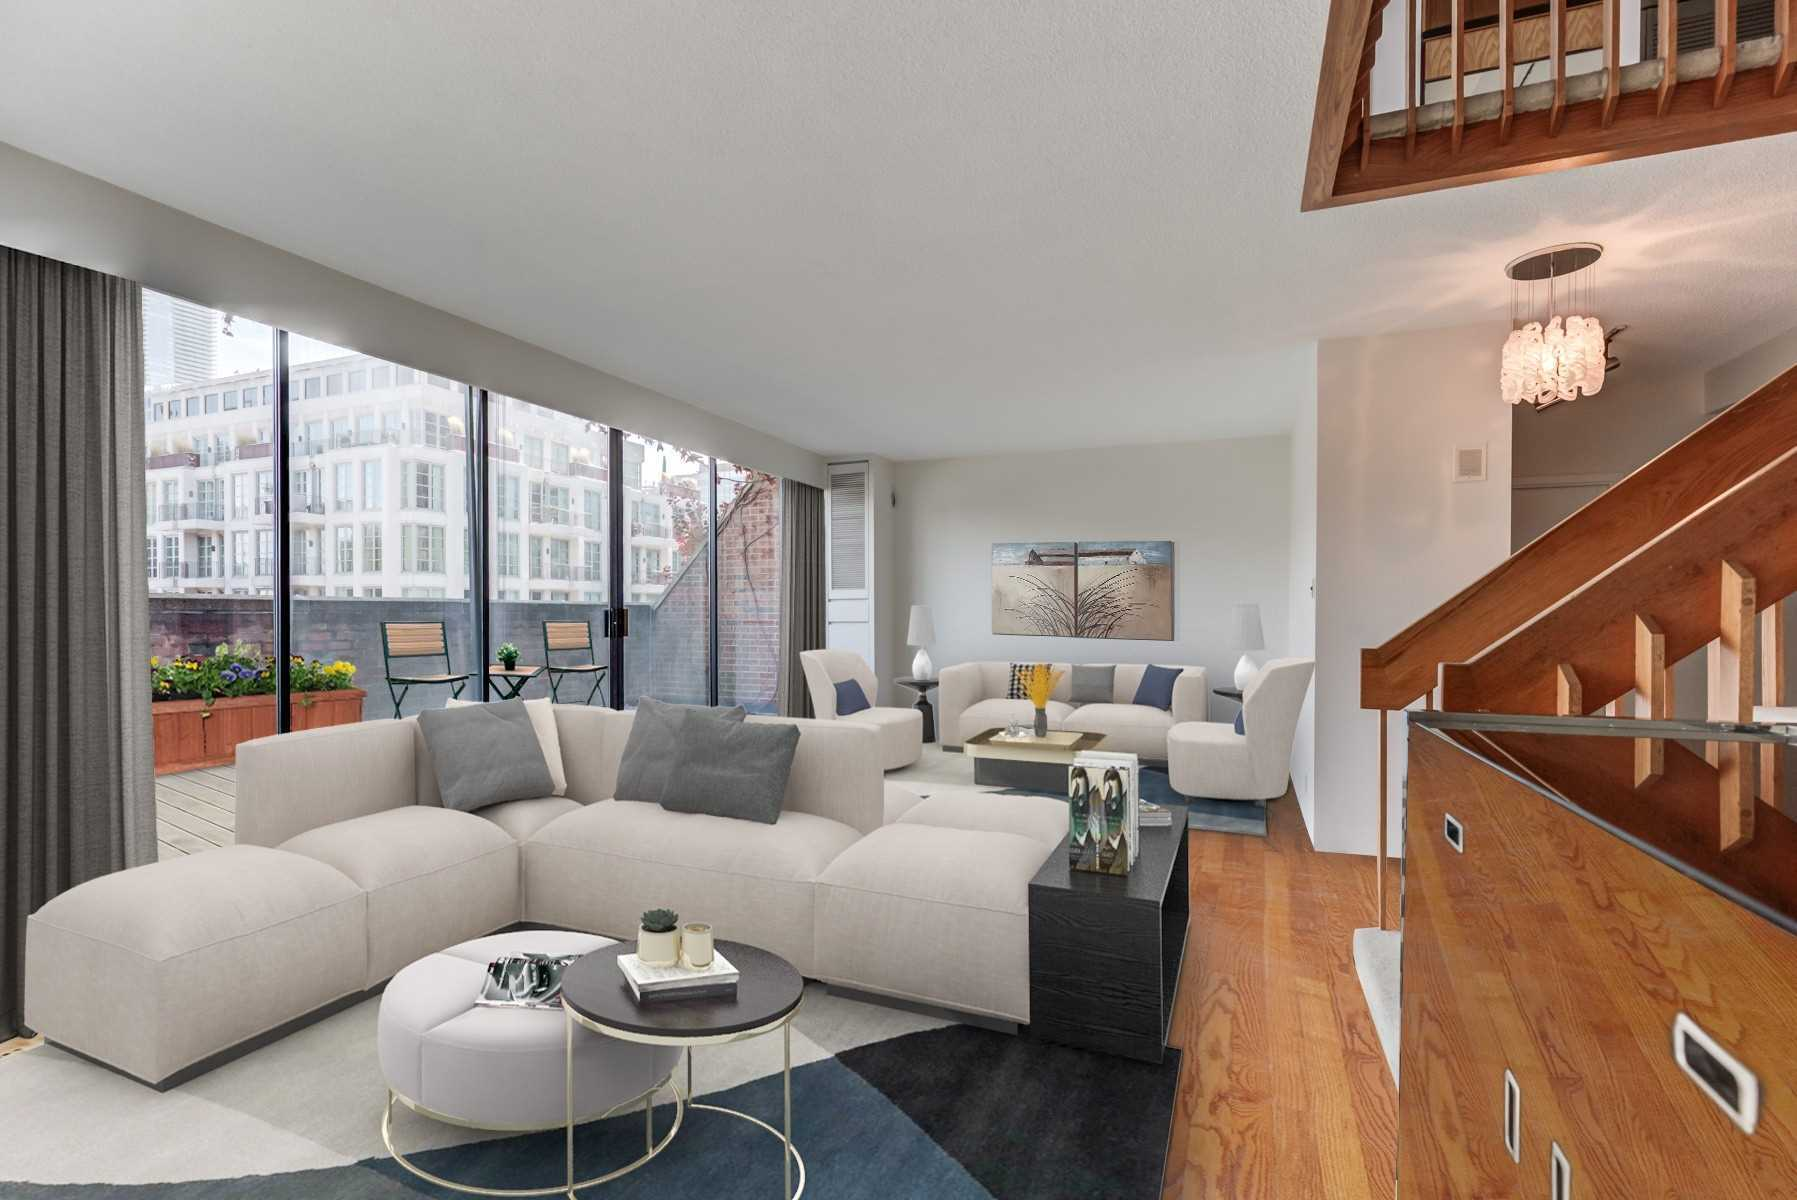 607 - 55A Avenue Rd - Annex Condo Apt for sale, 2 Bedrooms (C5185690) - #2